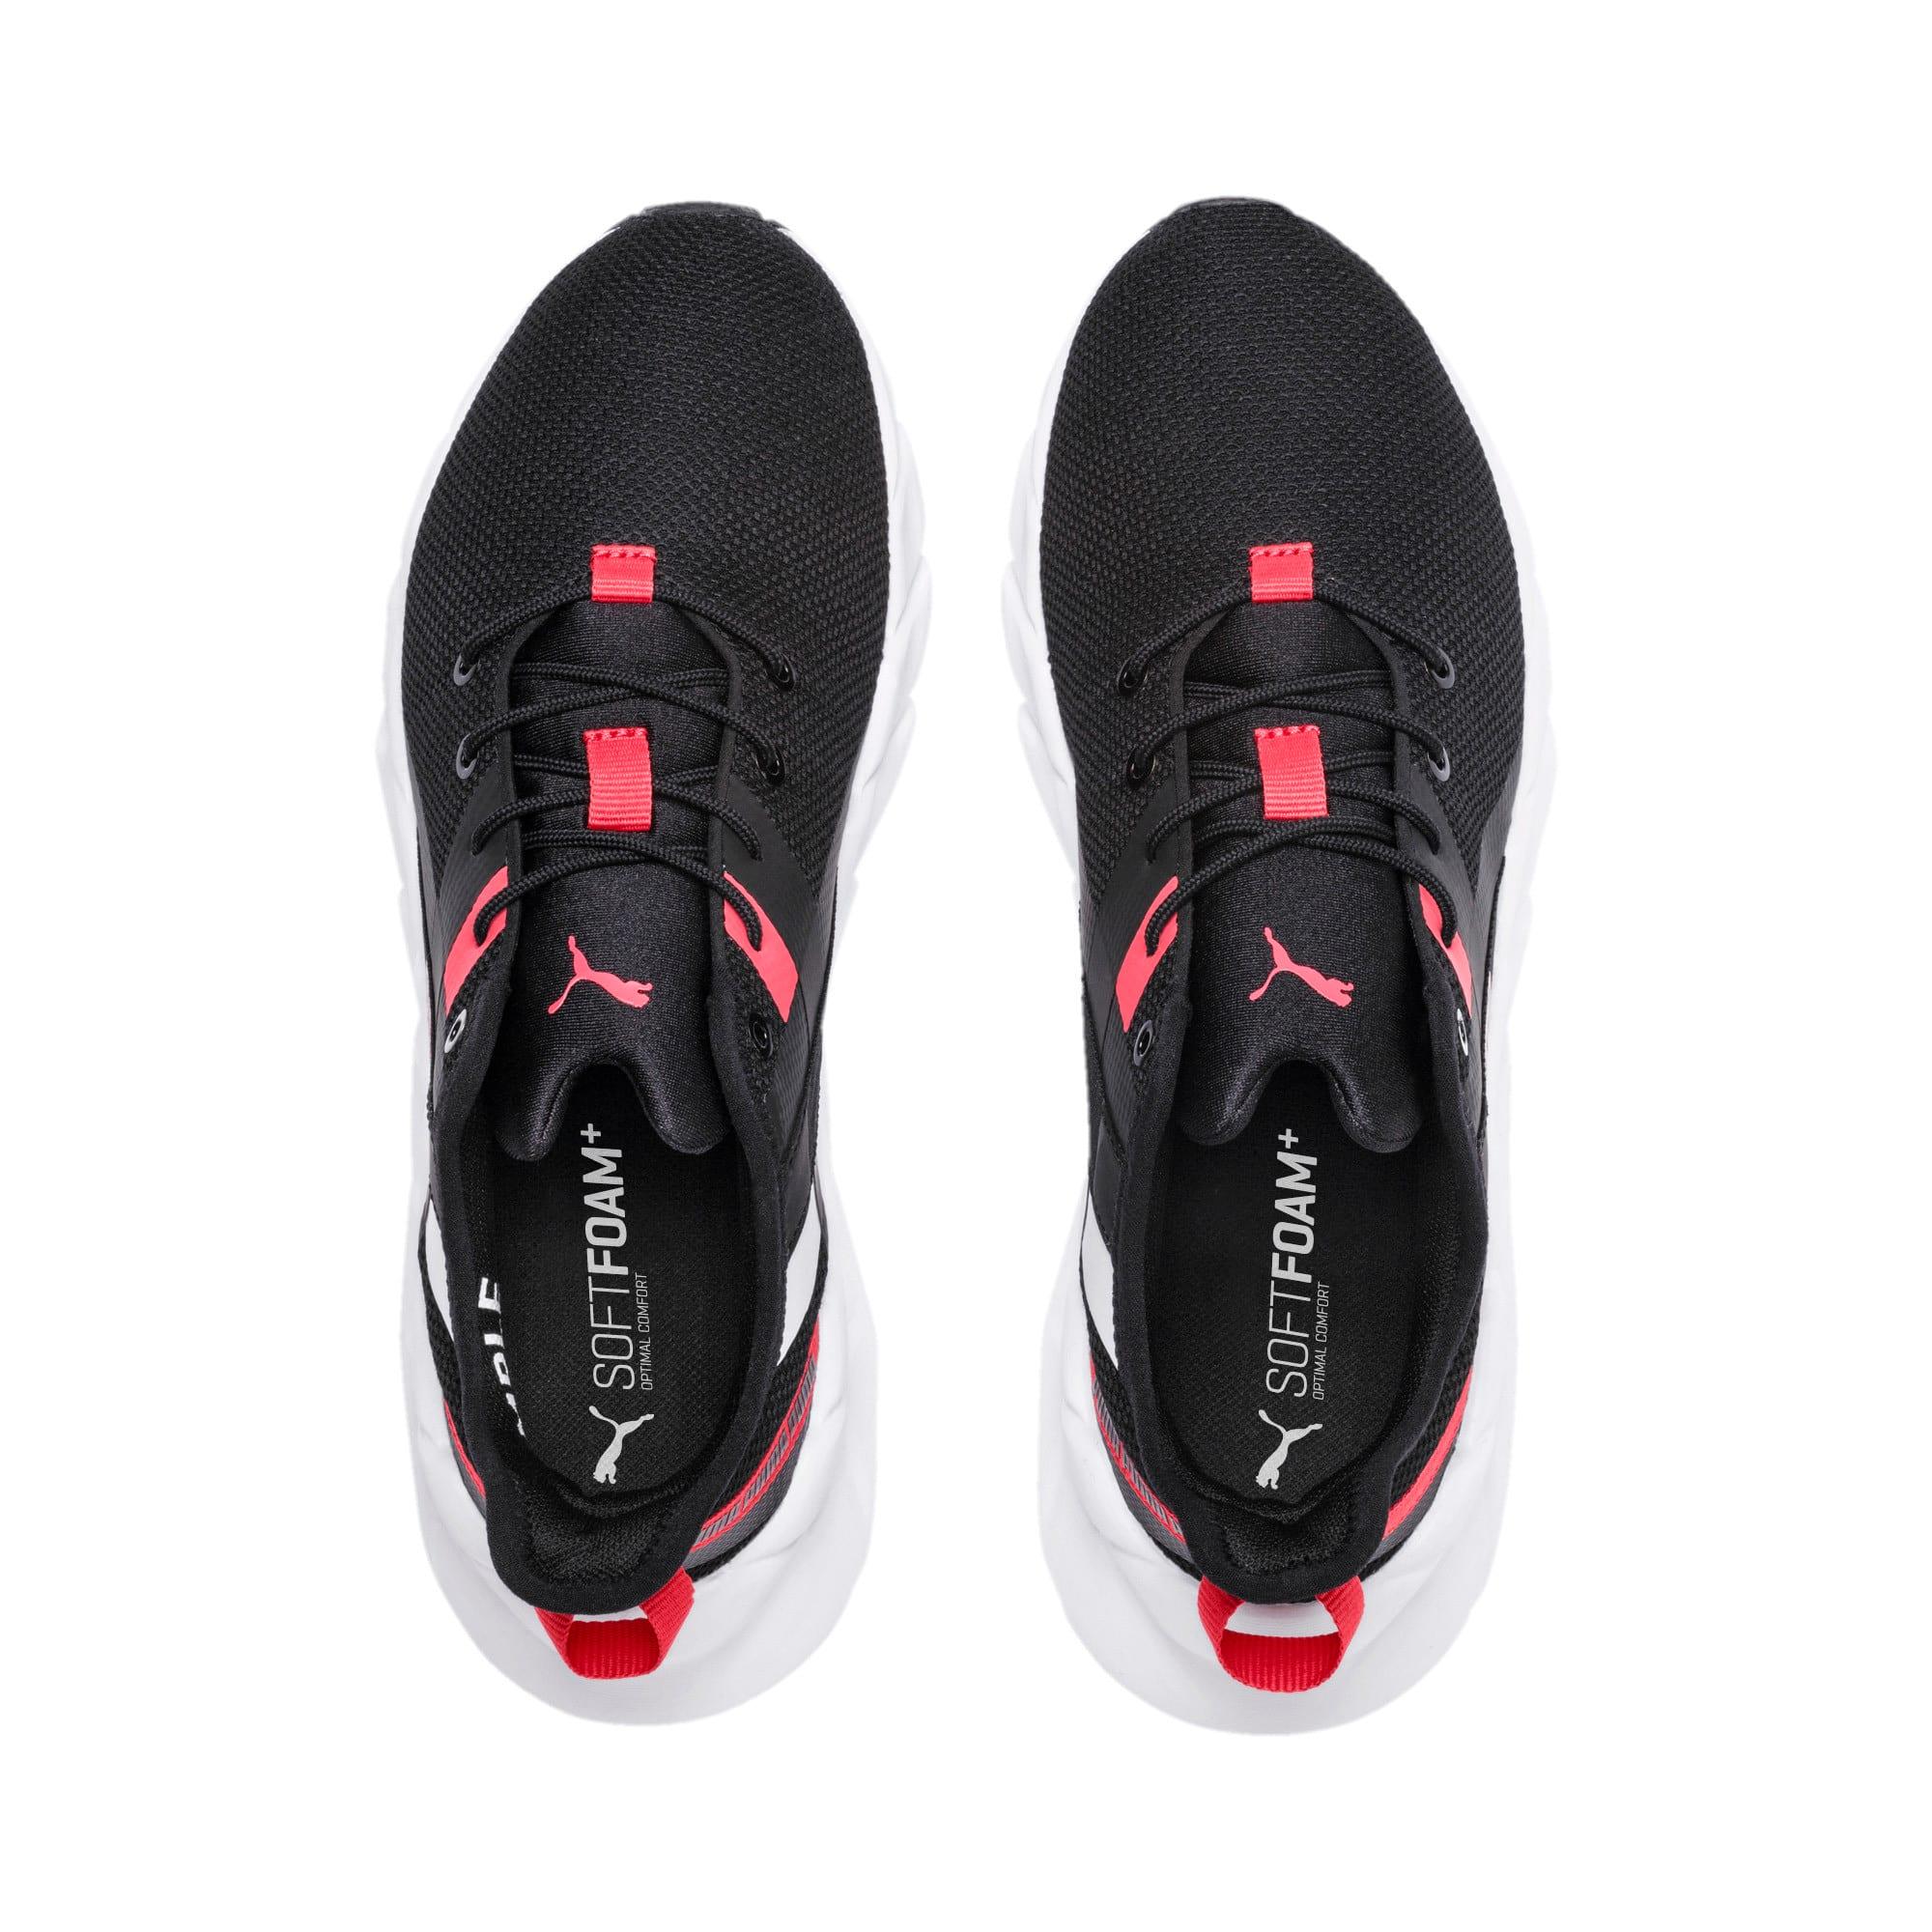 Thumbnail 6 of Weave XT Training Shoes JR, Black-White-Calypso Coral, medium